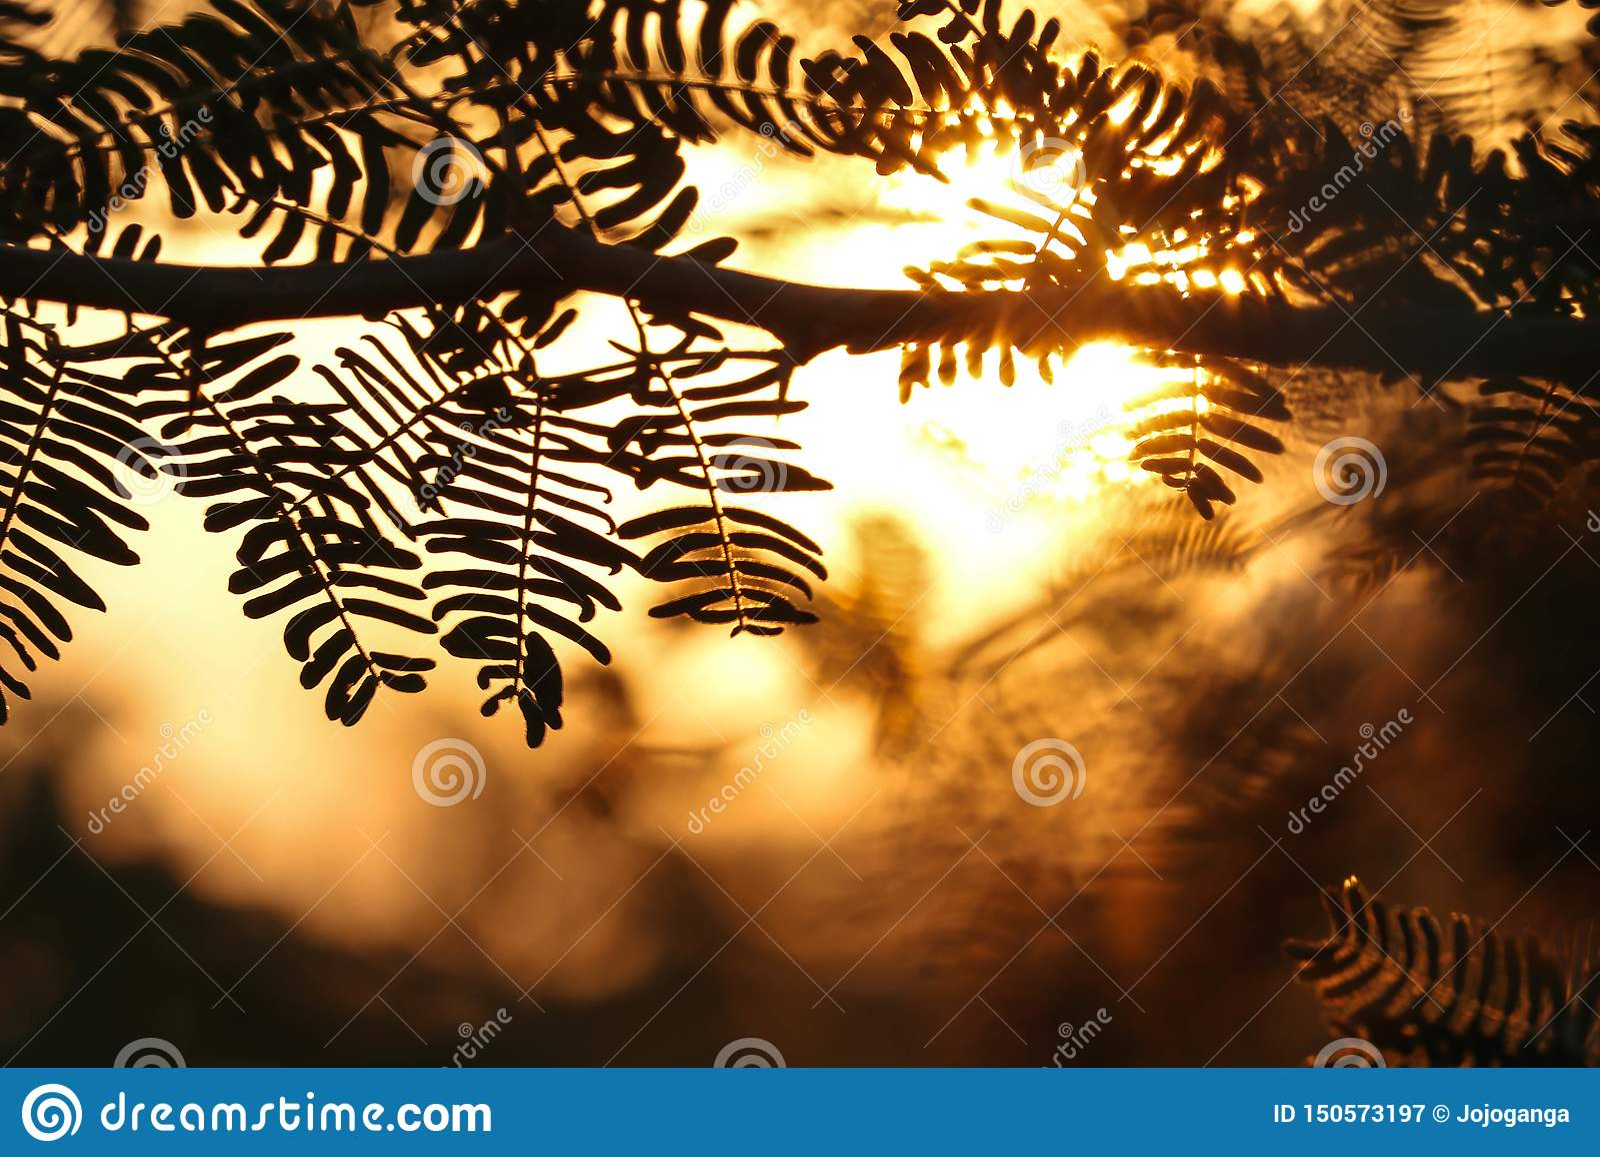 Восход солнца между листьями